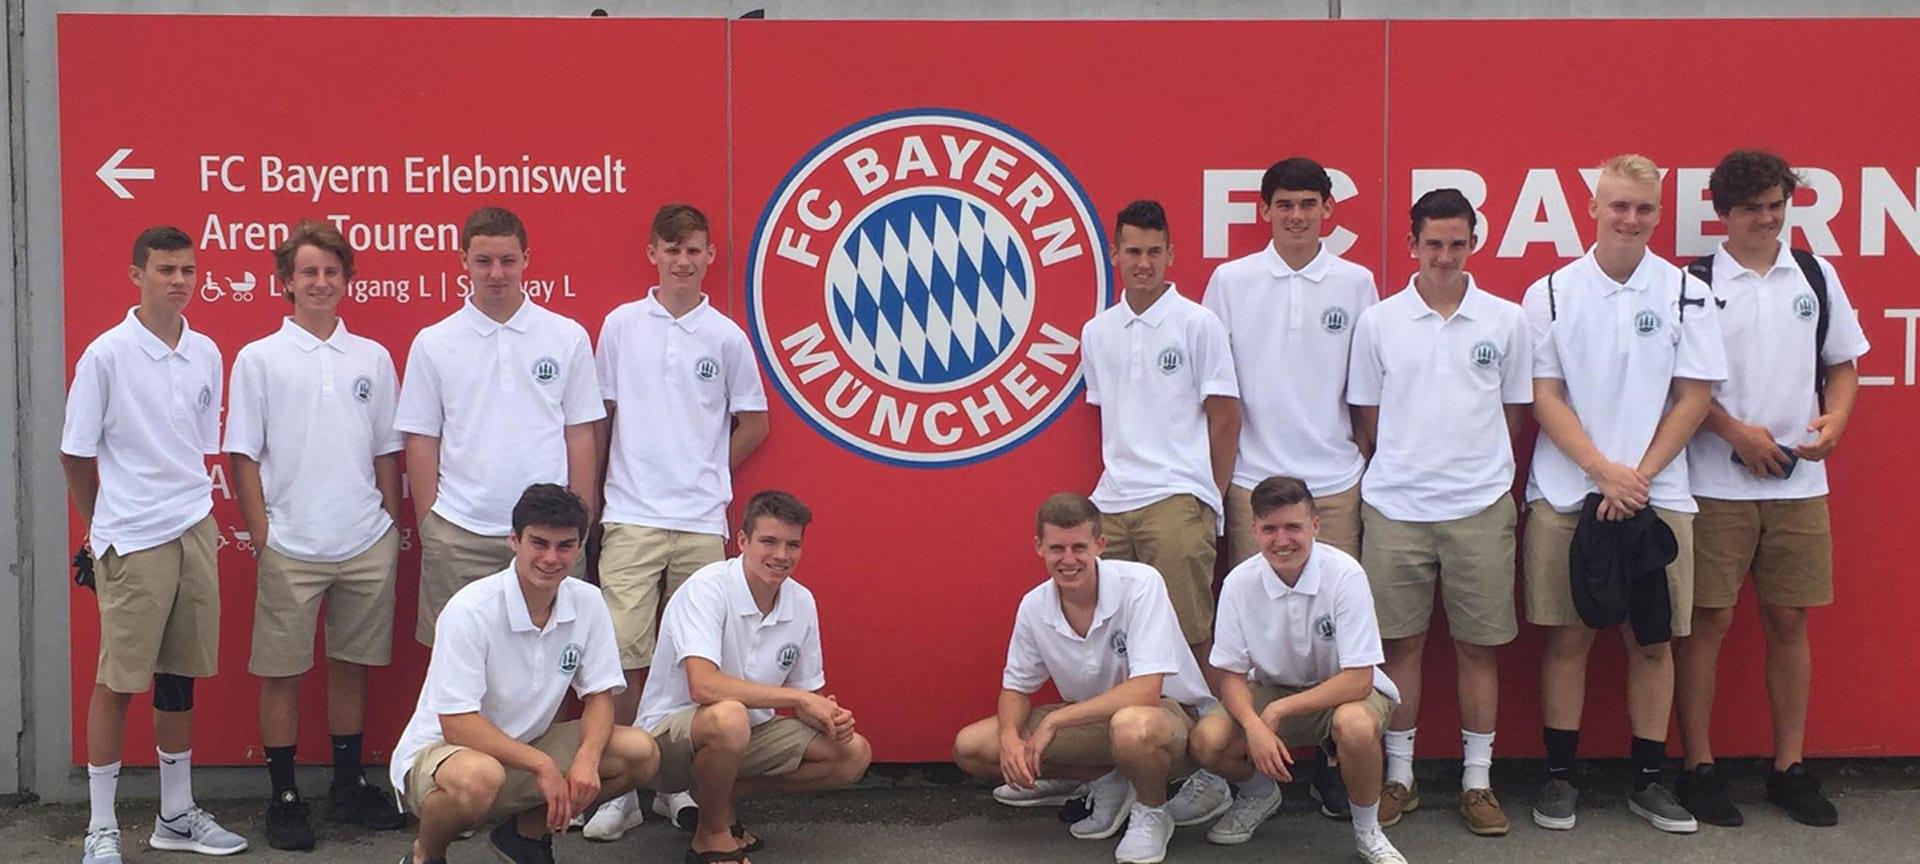 Bayern Munich Stadium Soccer Tour